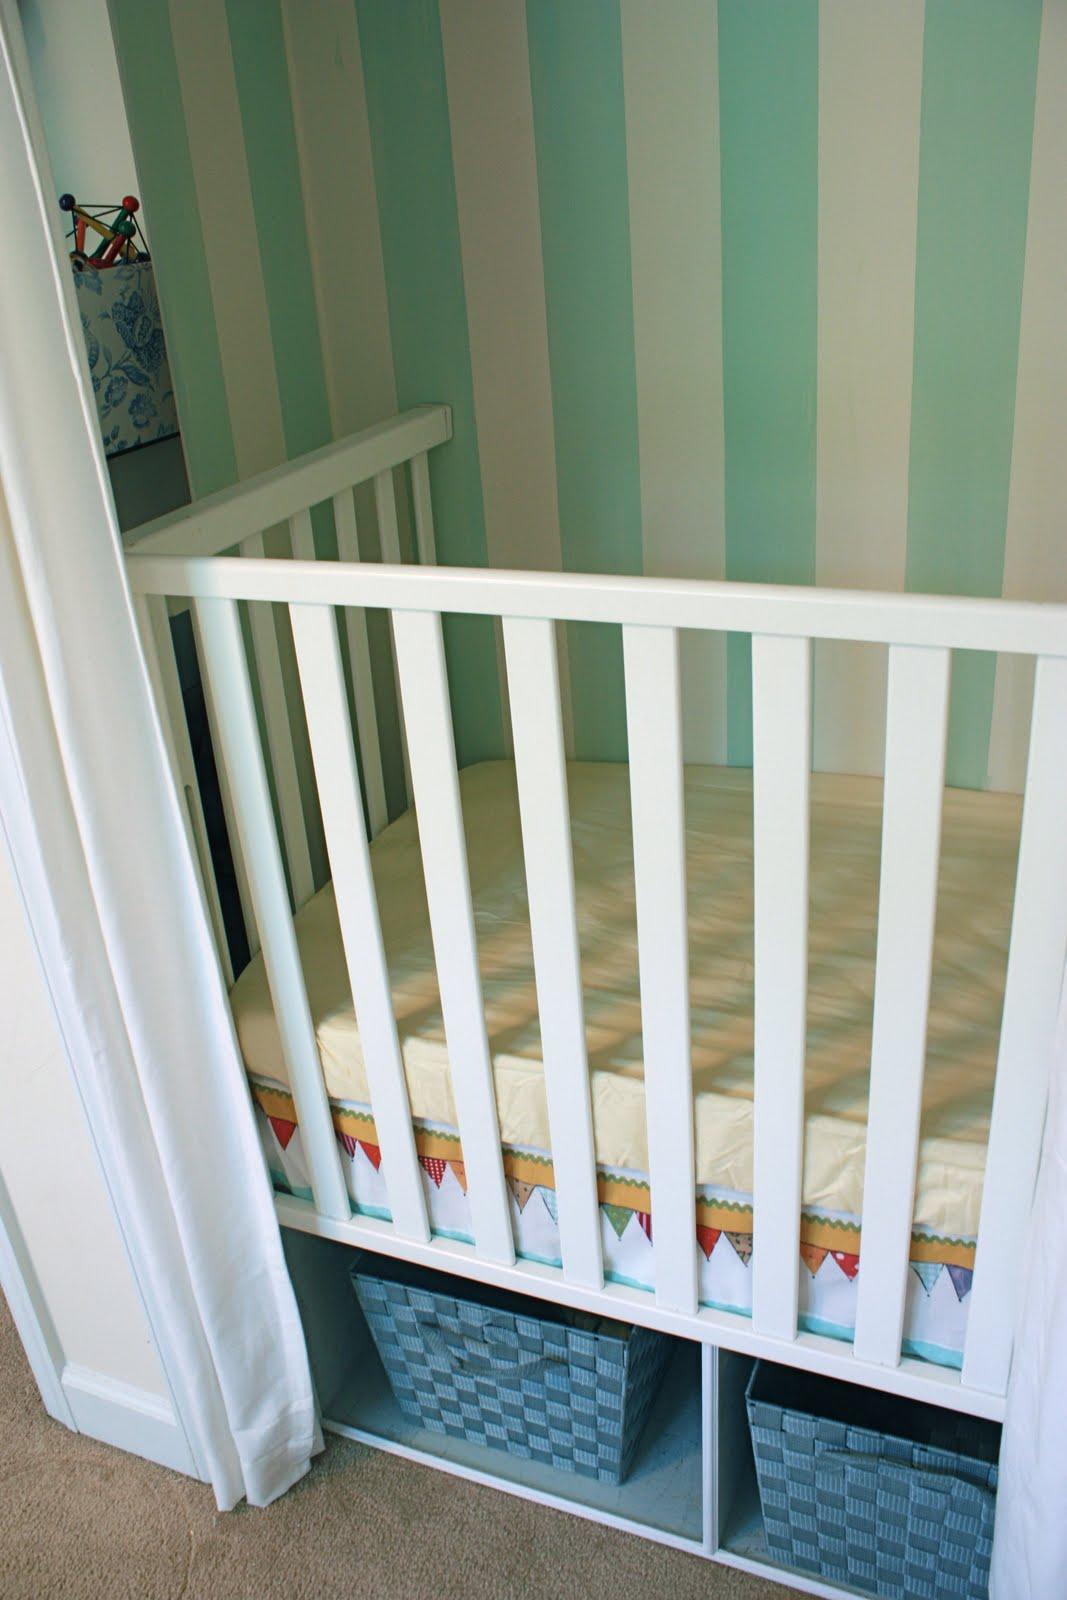 Dutch Cupboard Crib (okay, A Crib Built In The Closet)   Live Free Creative  Co